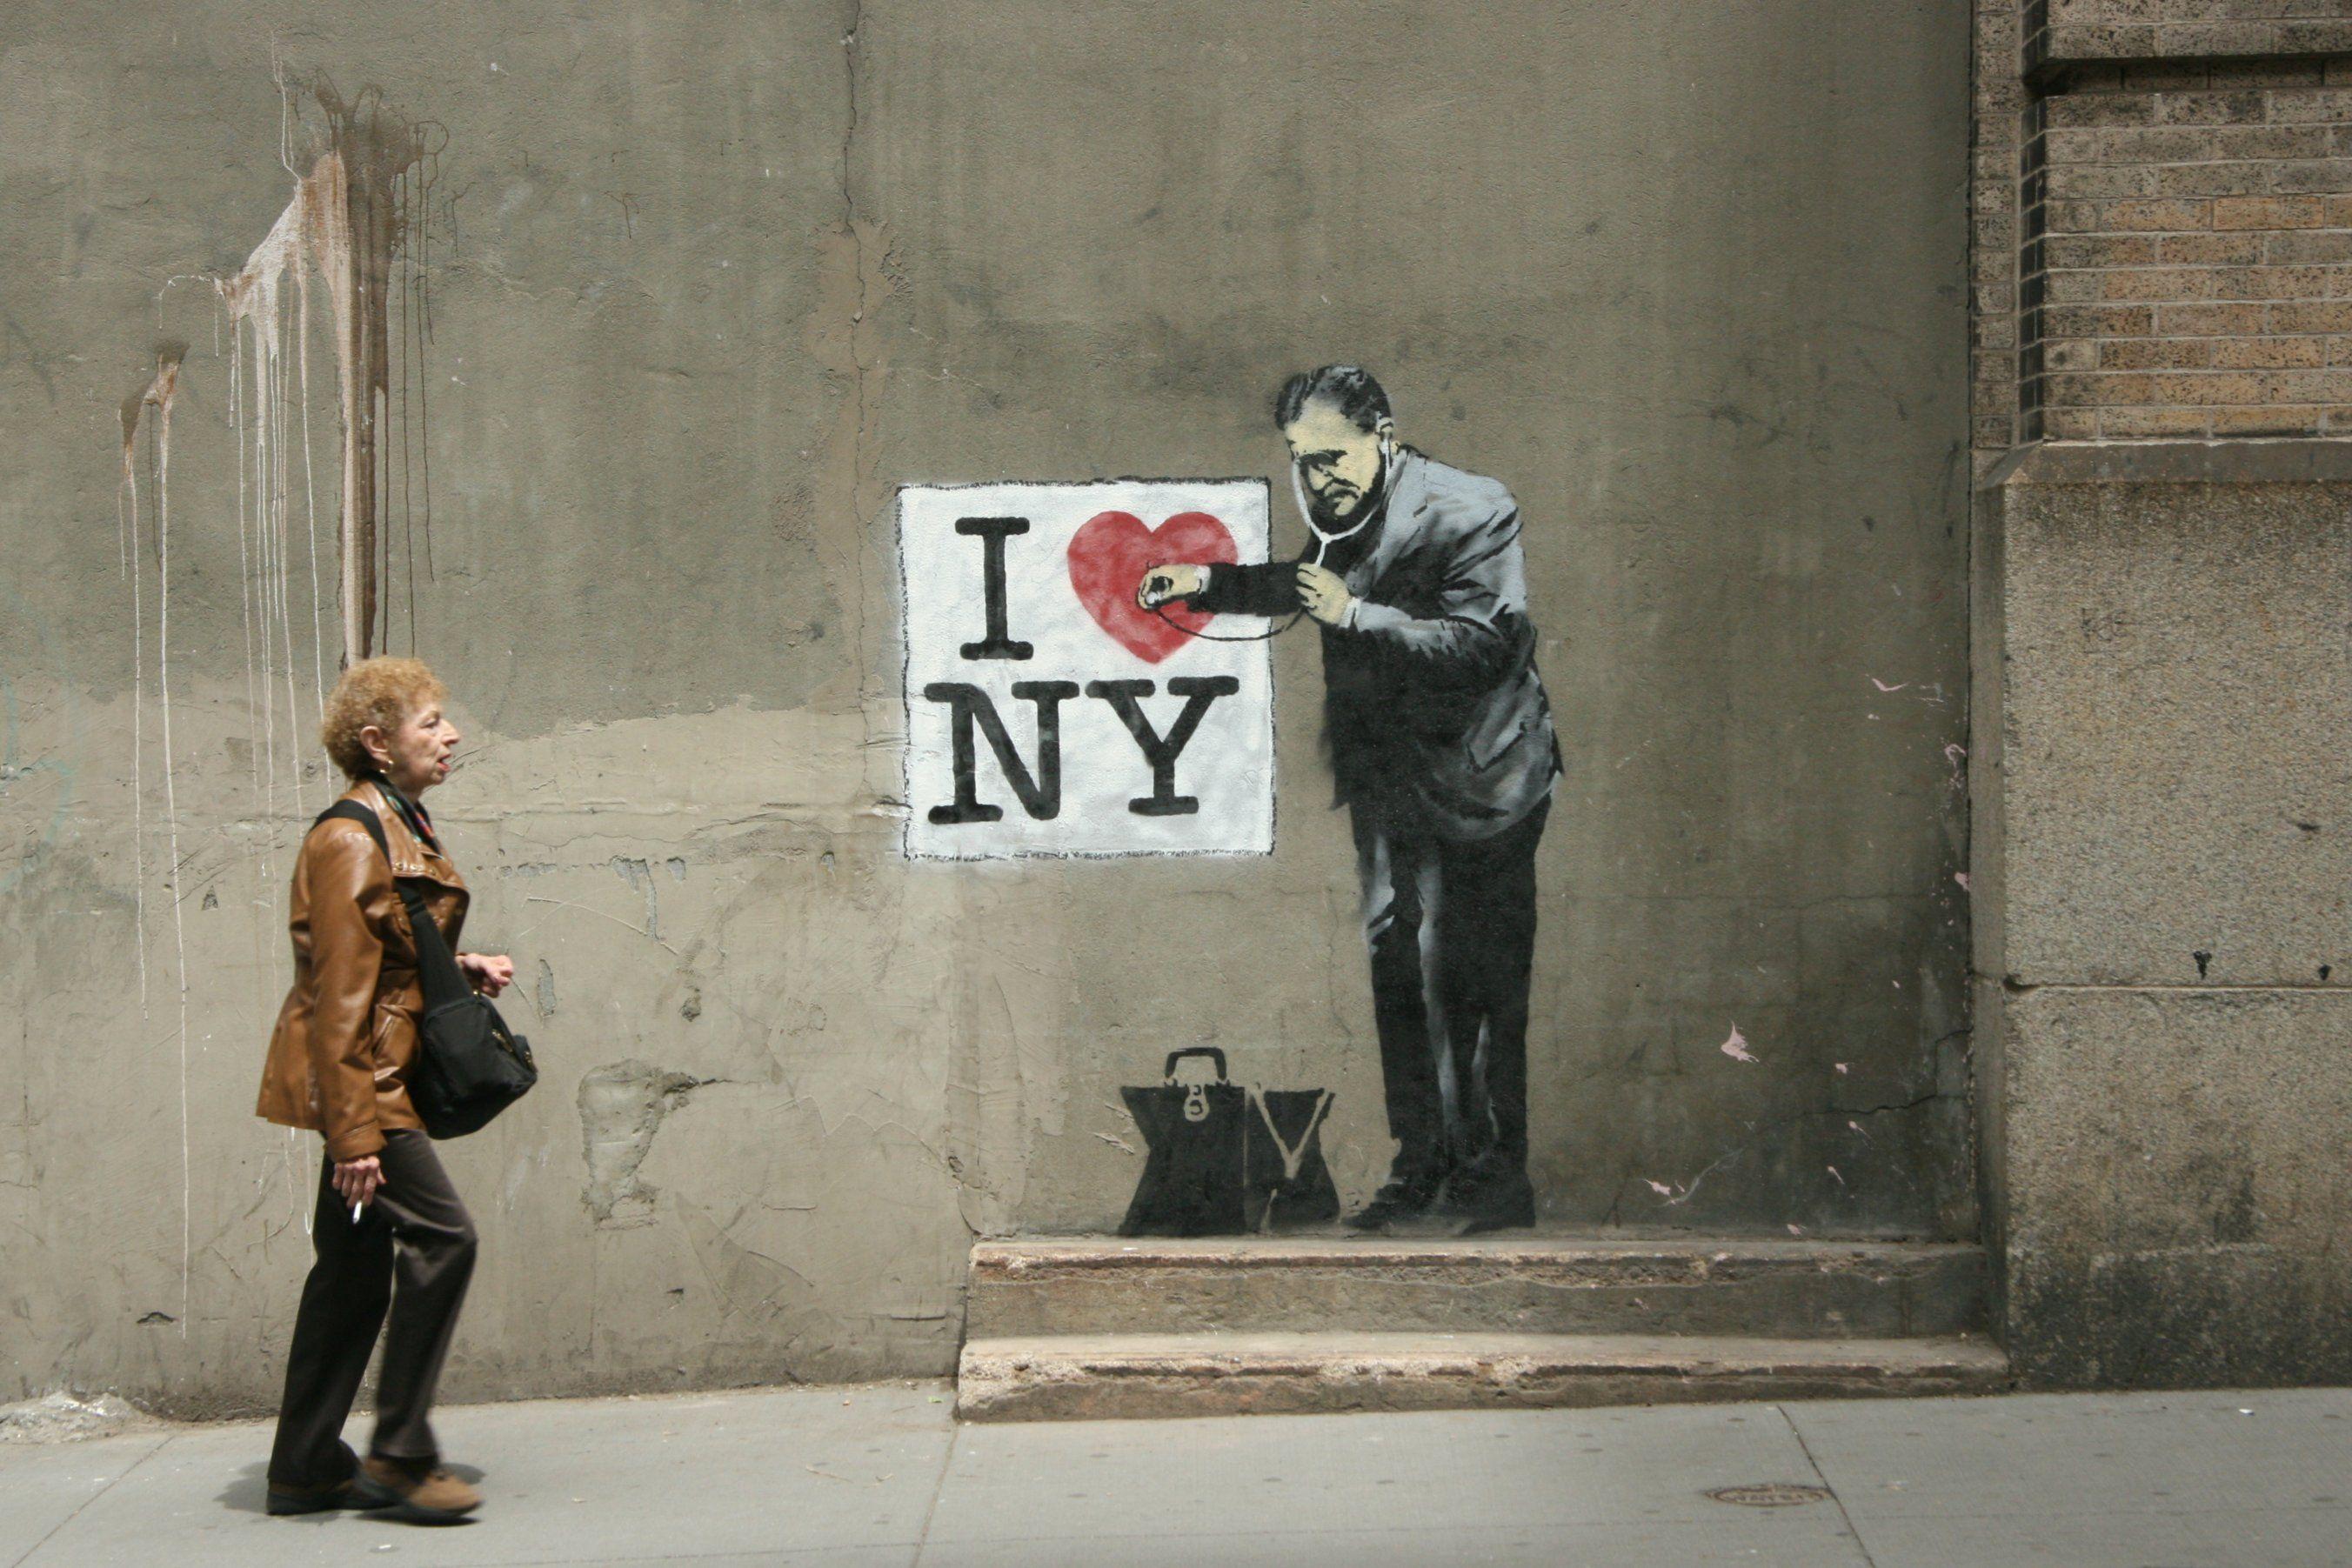 Banksy Banksy art, Street art banksy